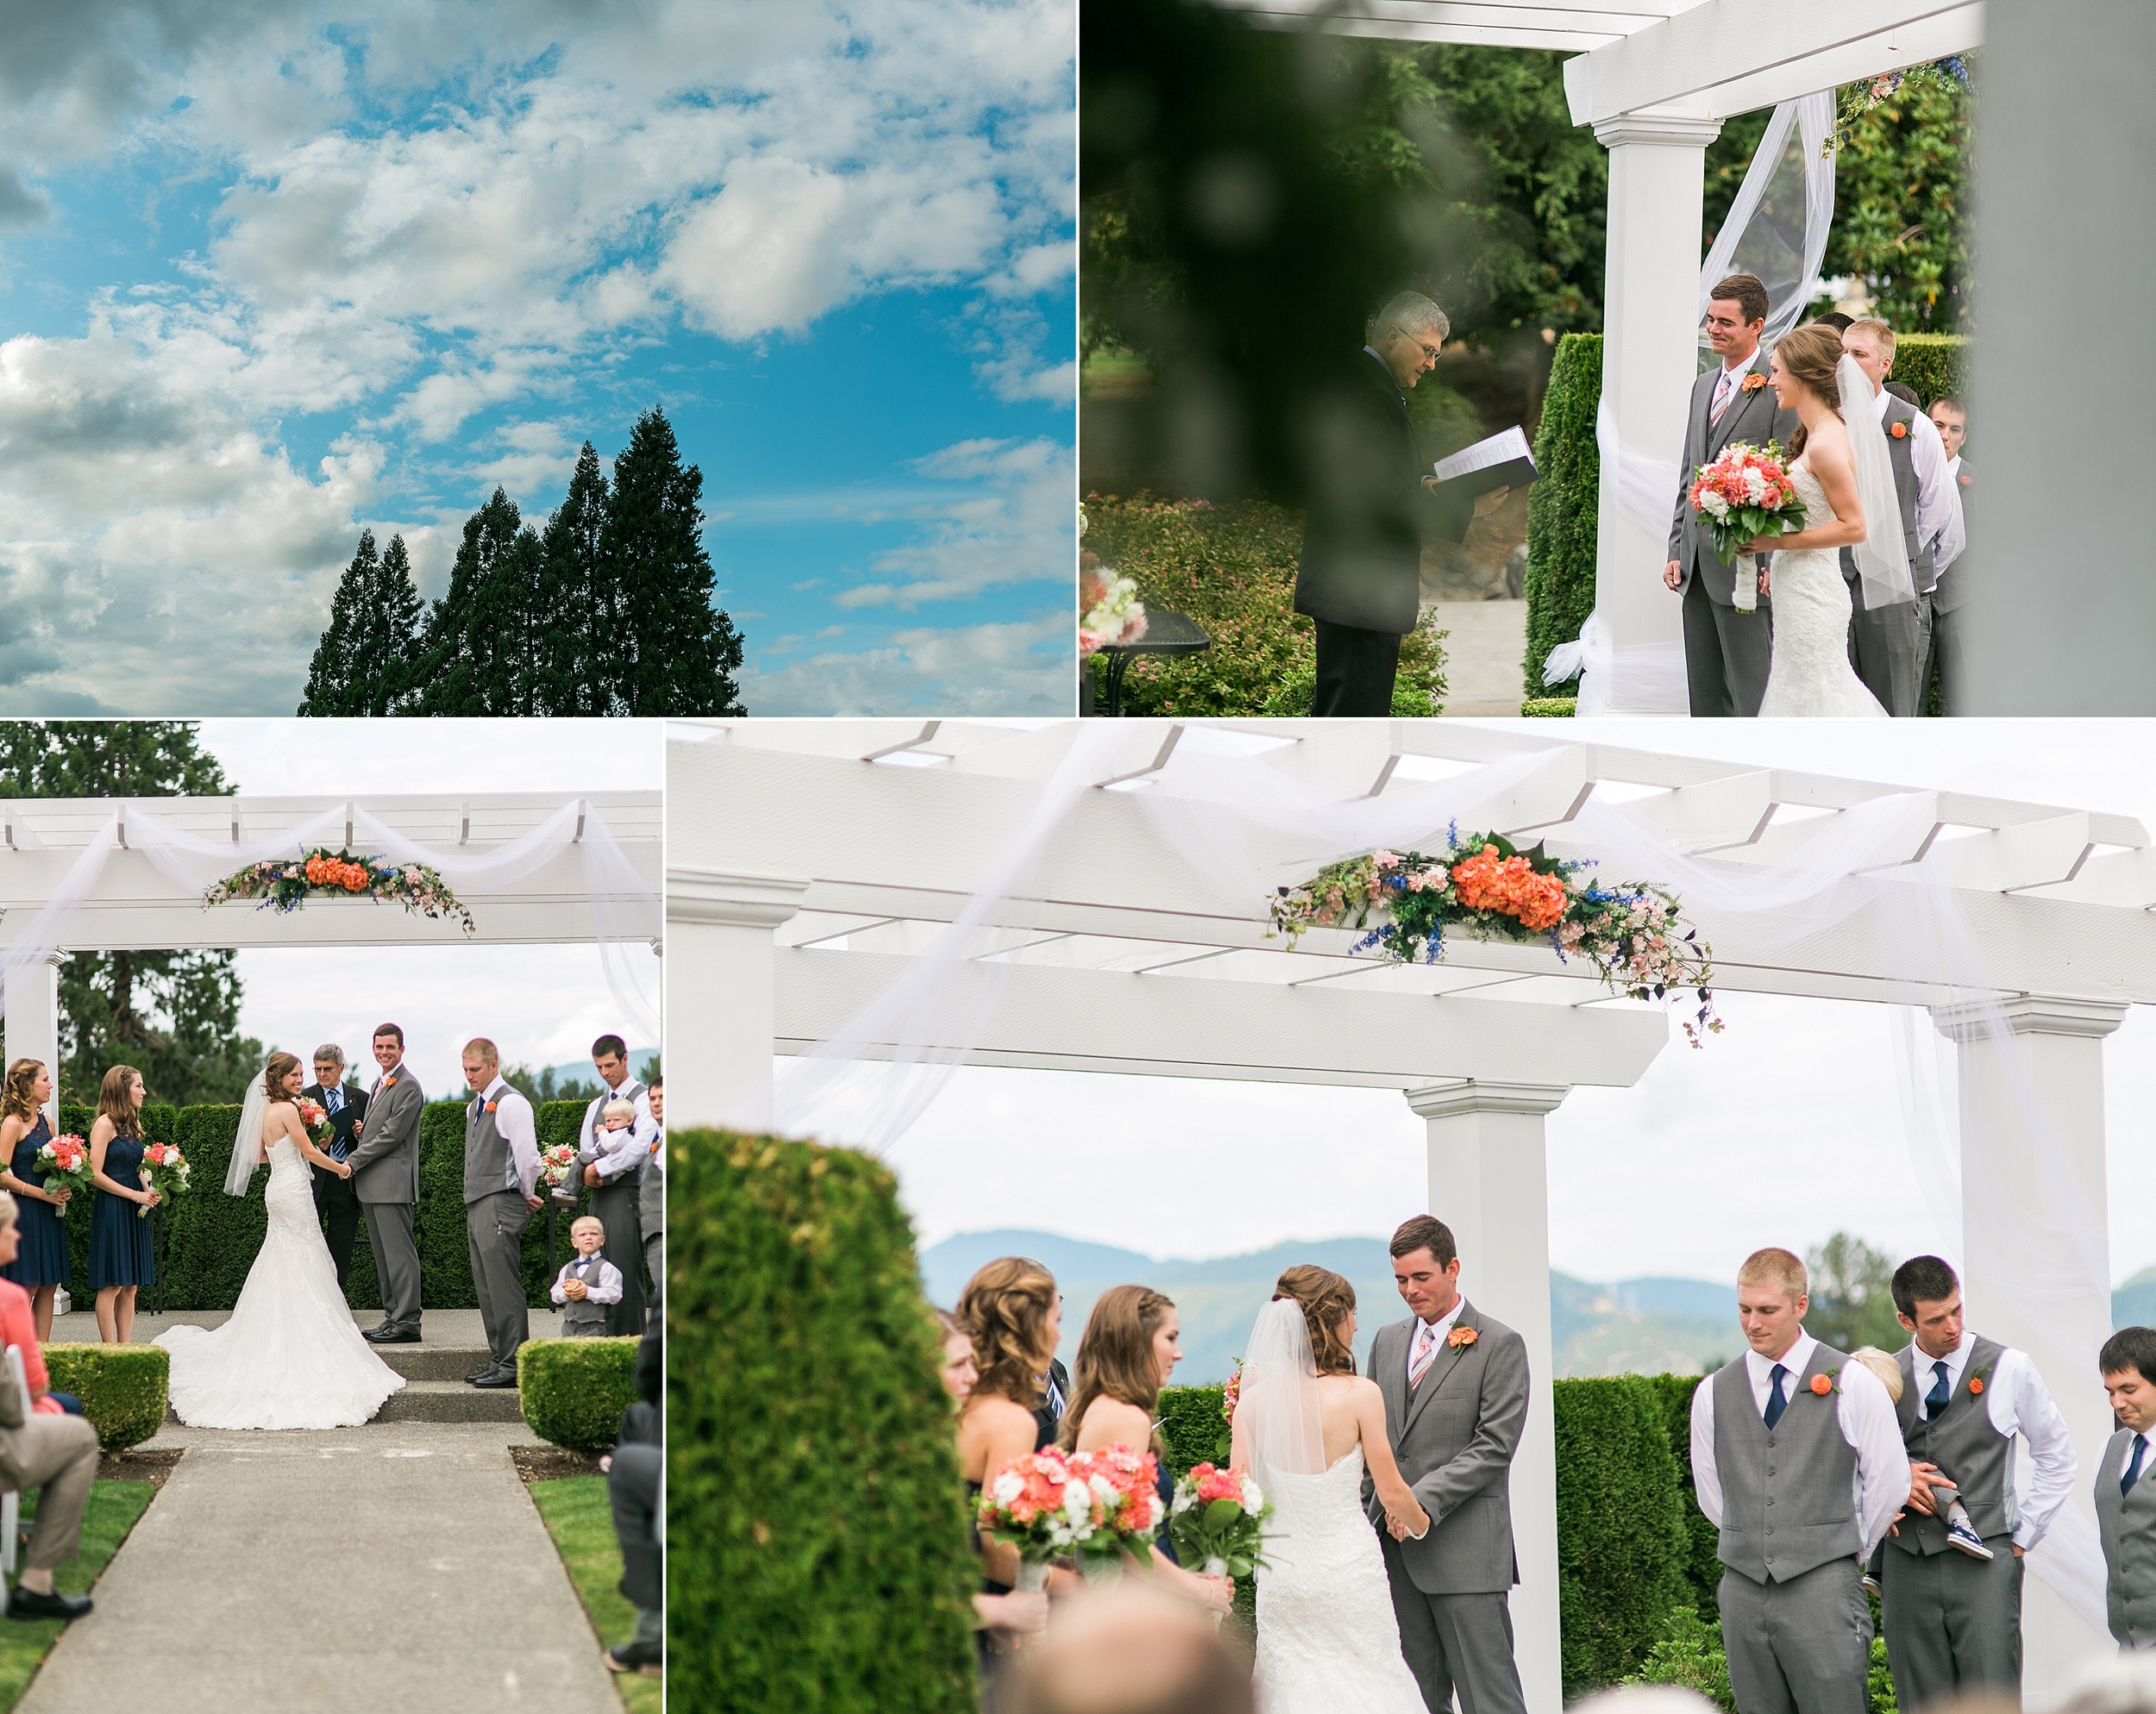 ashley vos photography seattle area wedding photographer_0673.jpg